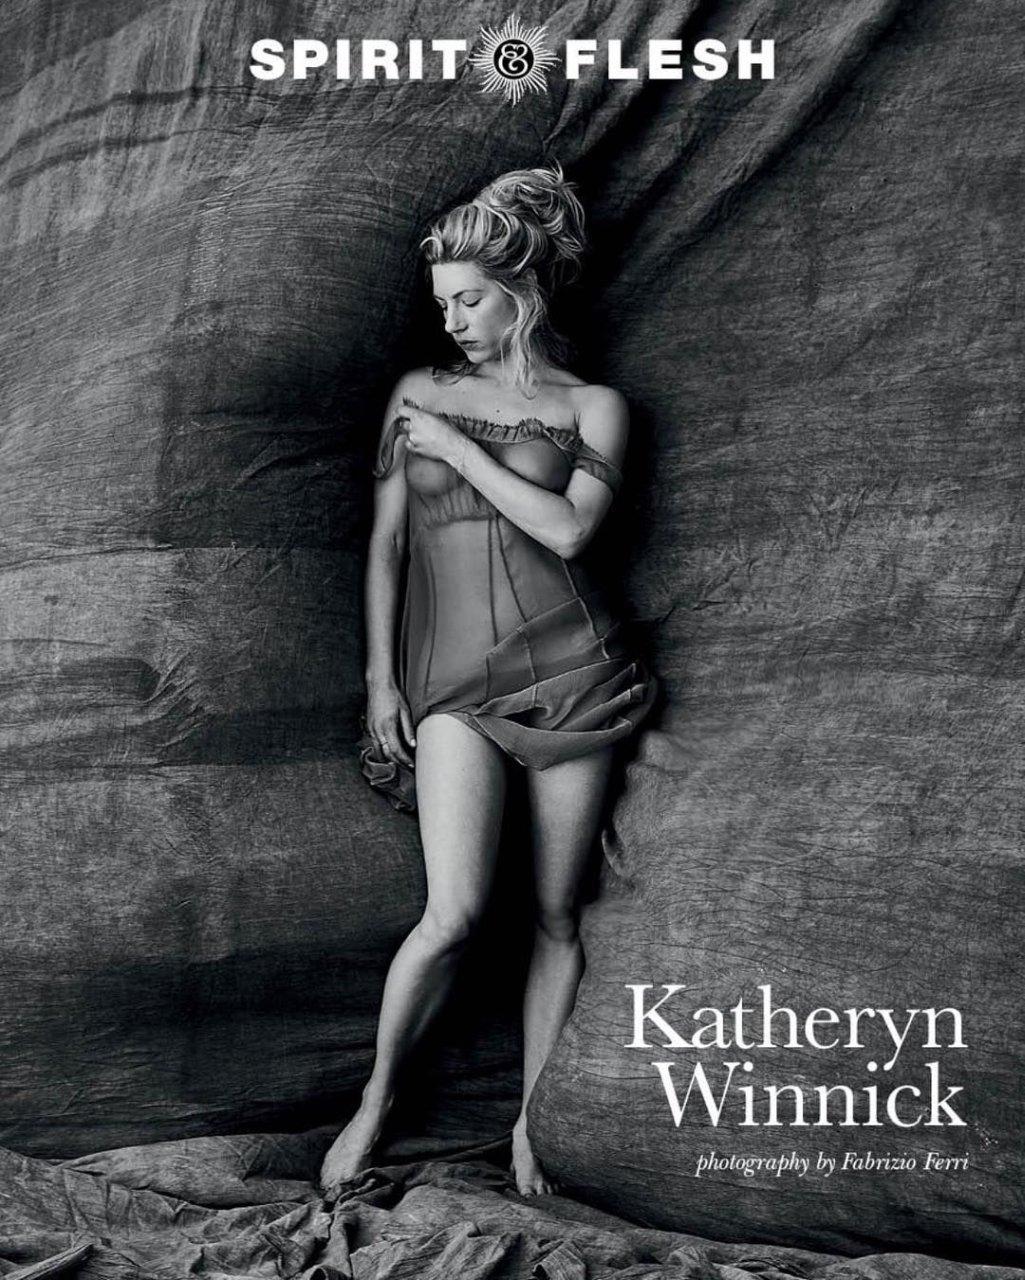 Katheryn winnick nude pics